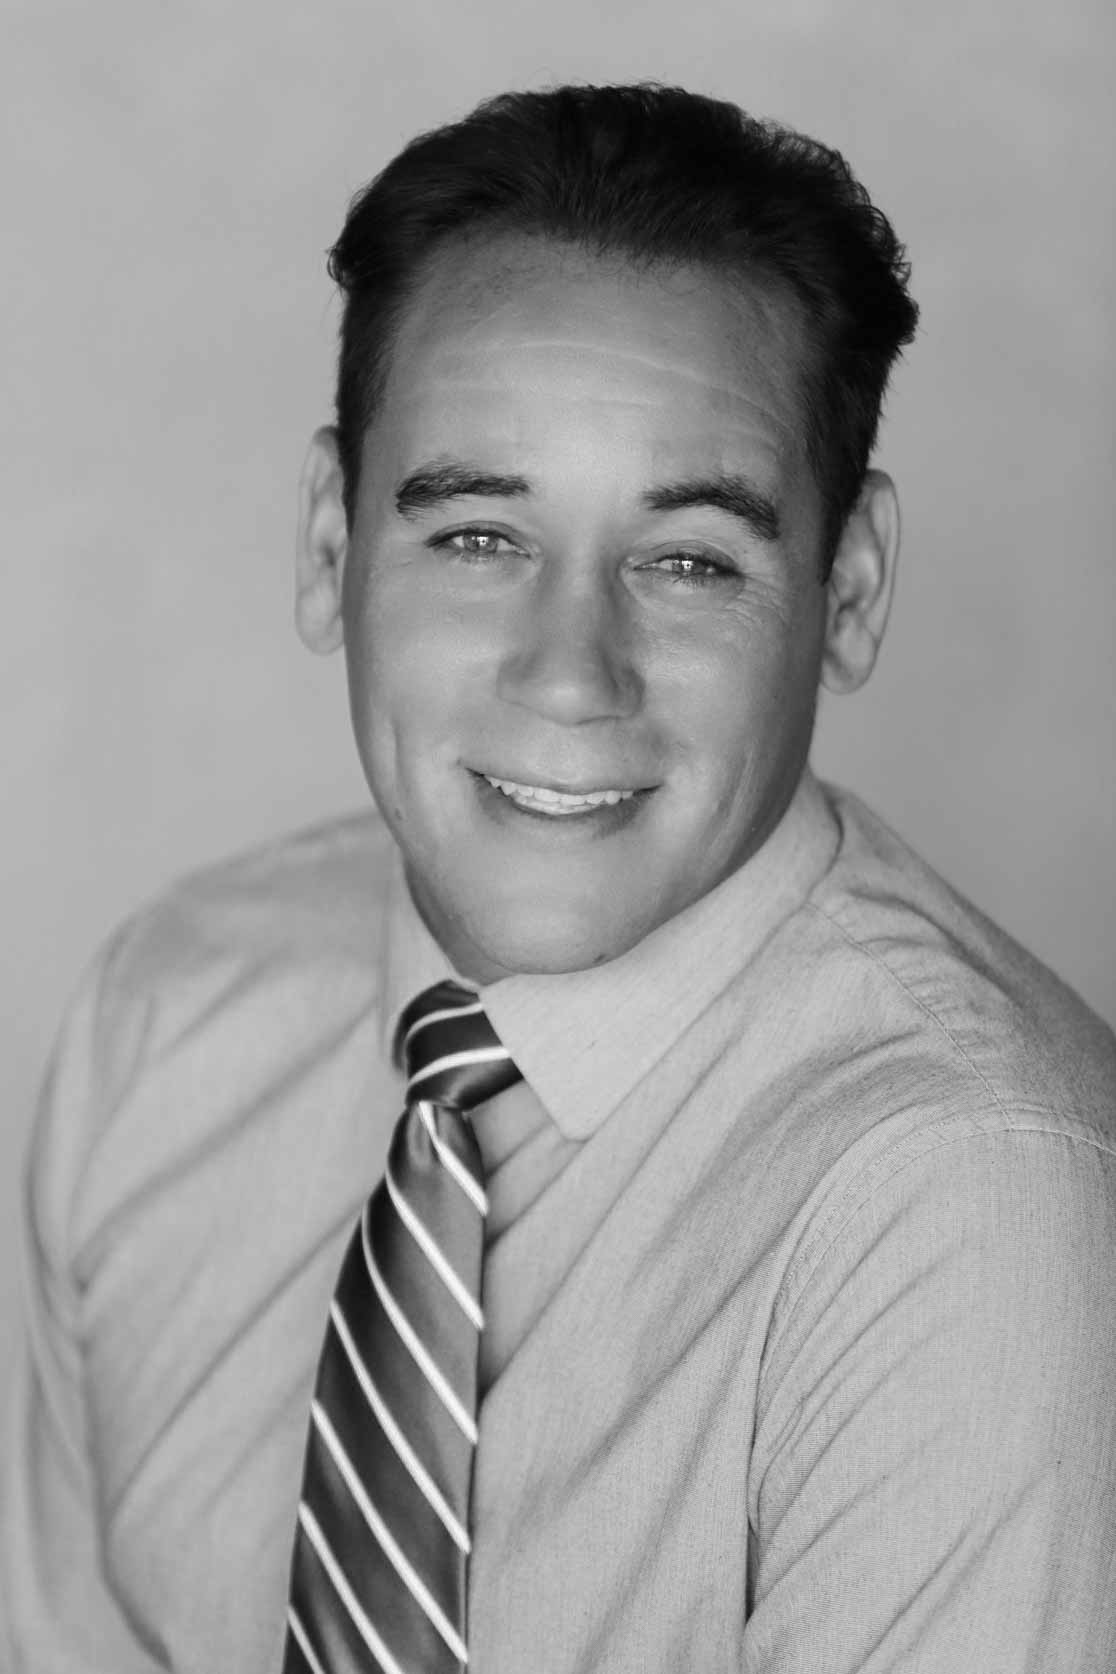 Jeffrey Belzer